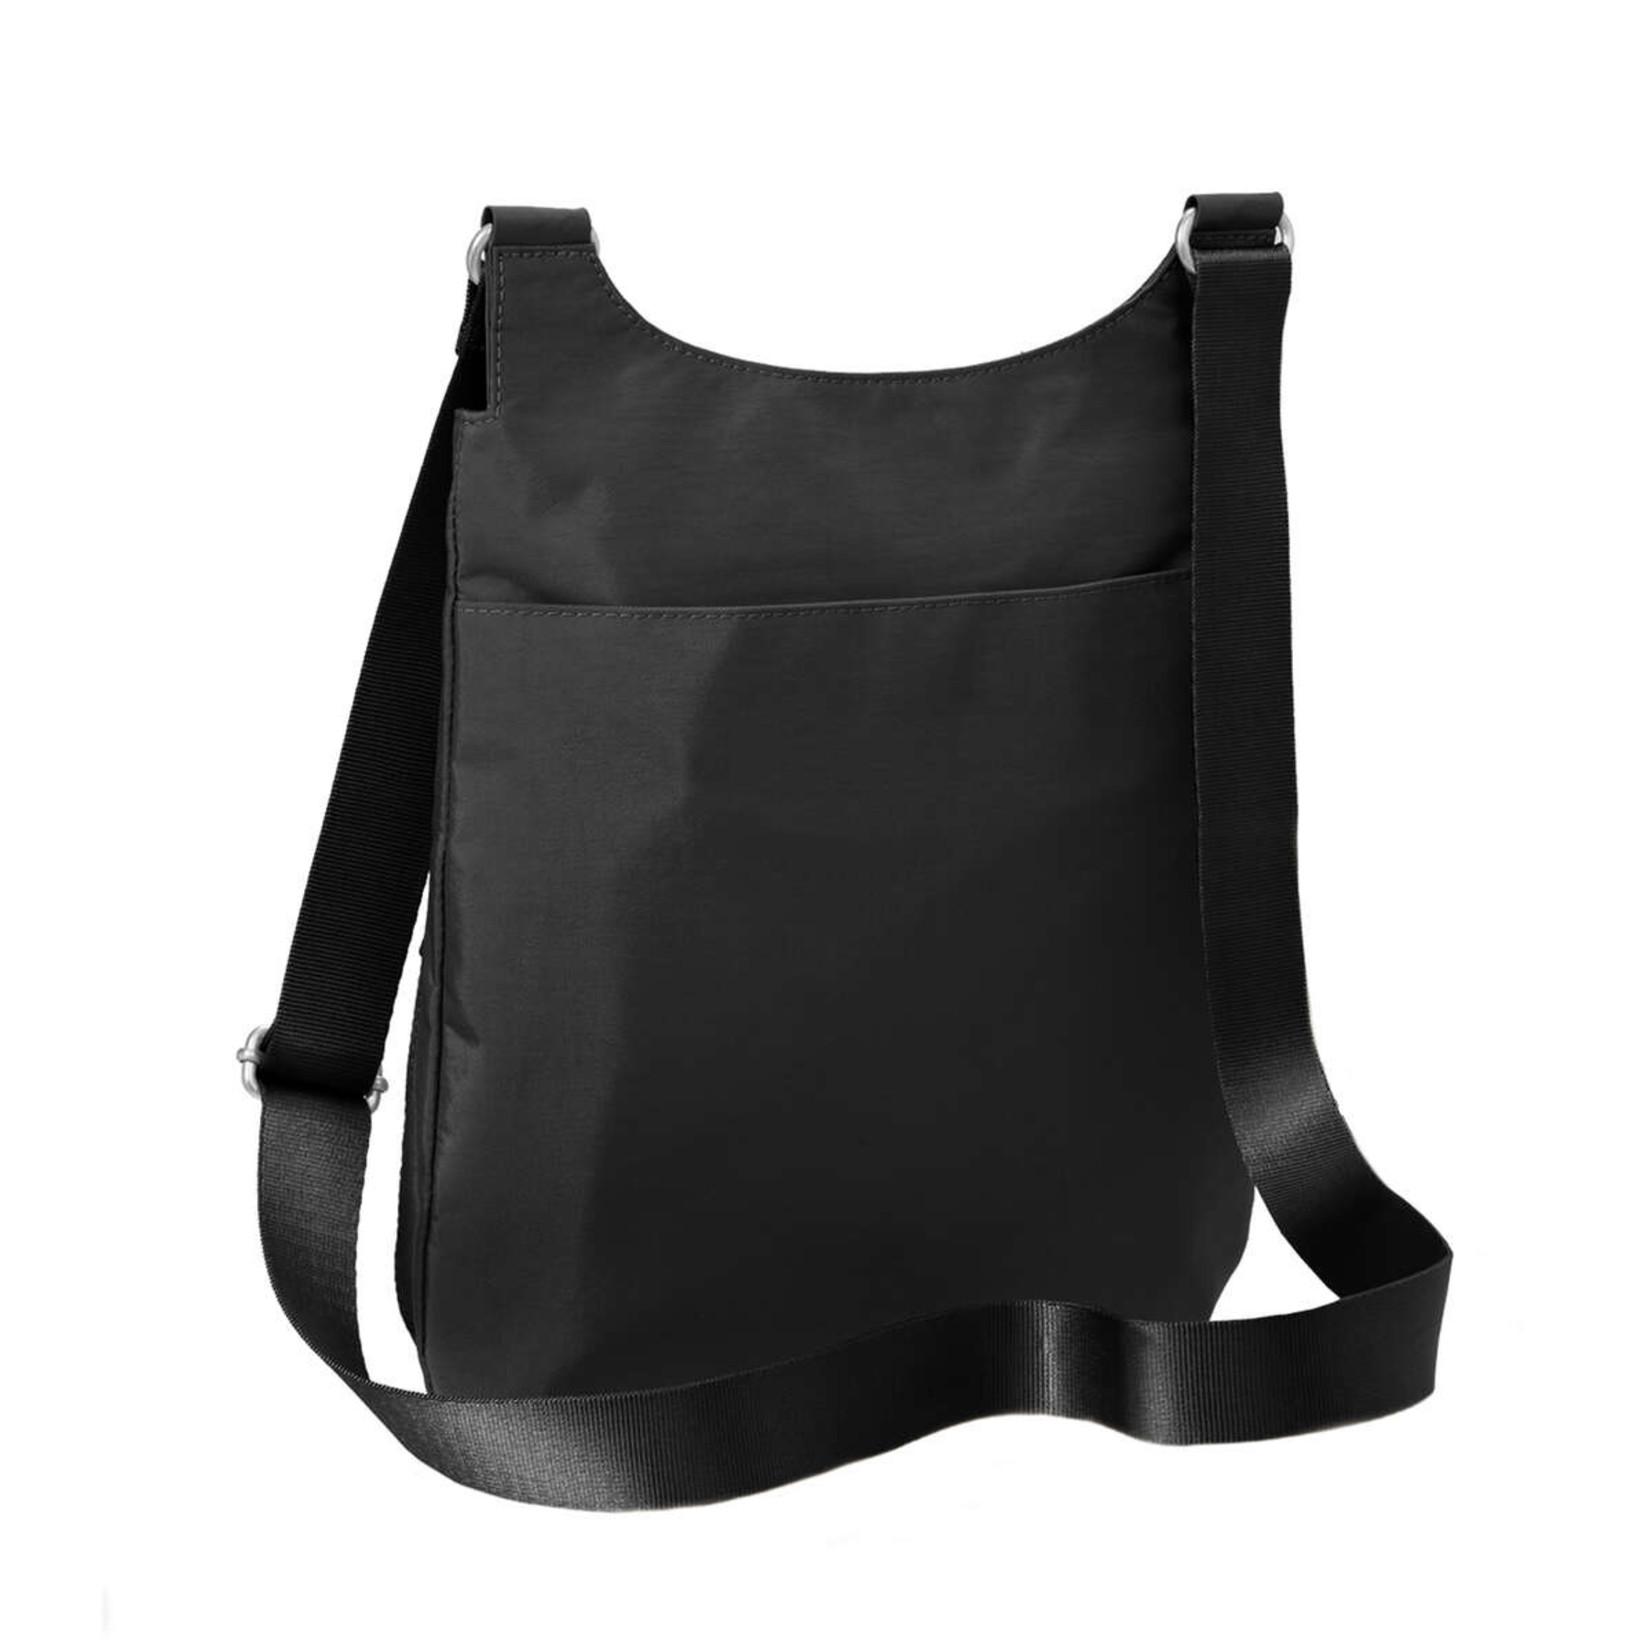 Baggallini AROUND TOWN BAG IN  BLACK